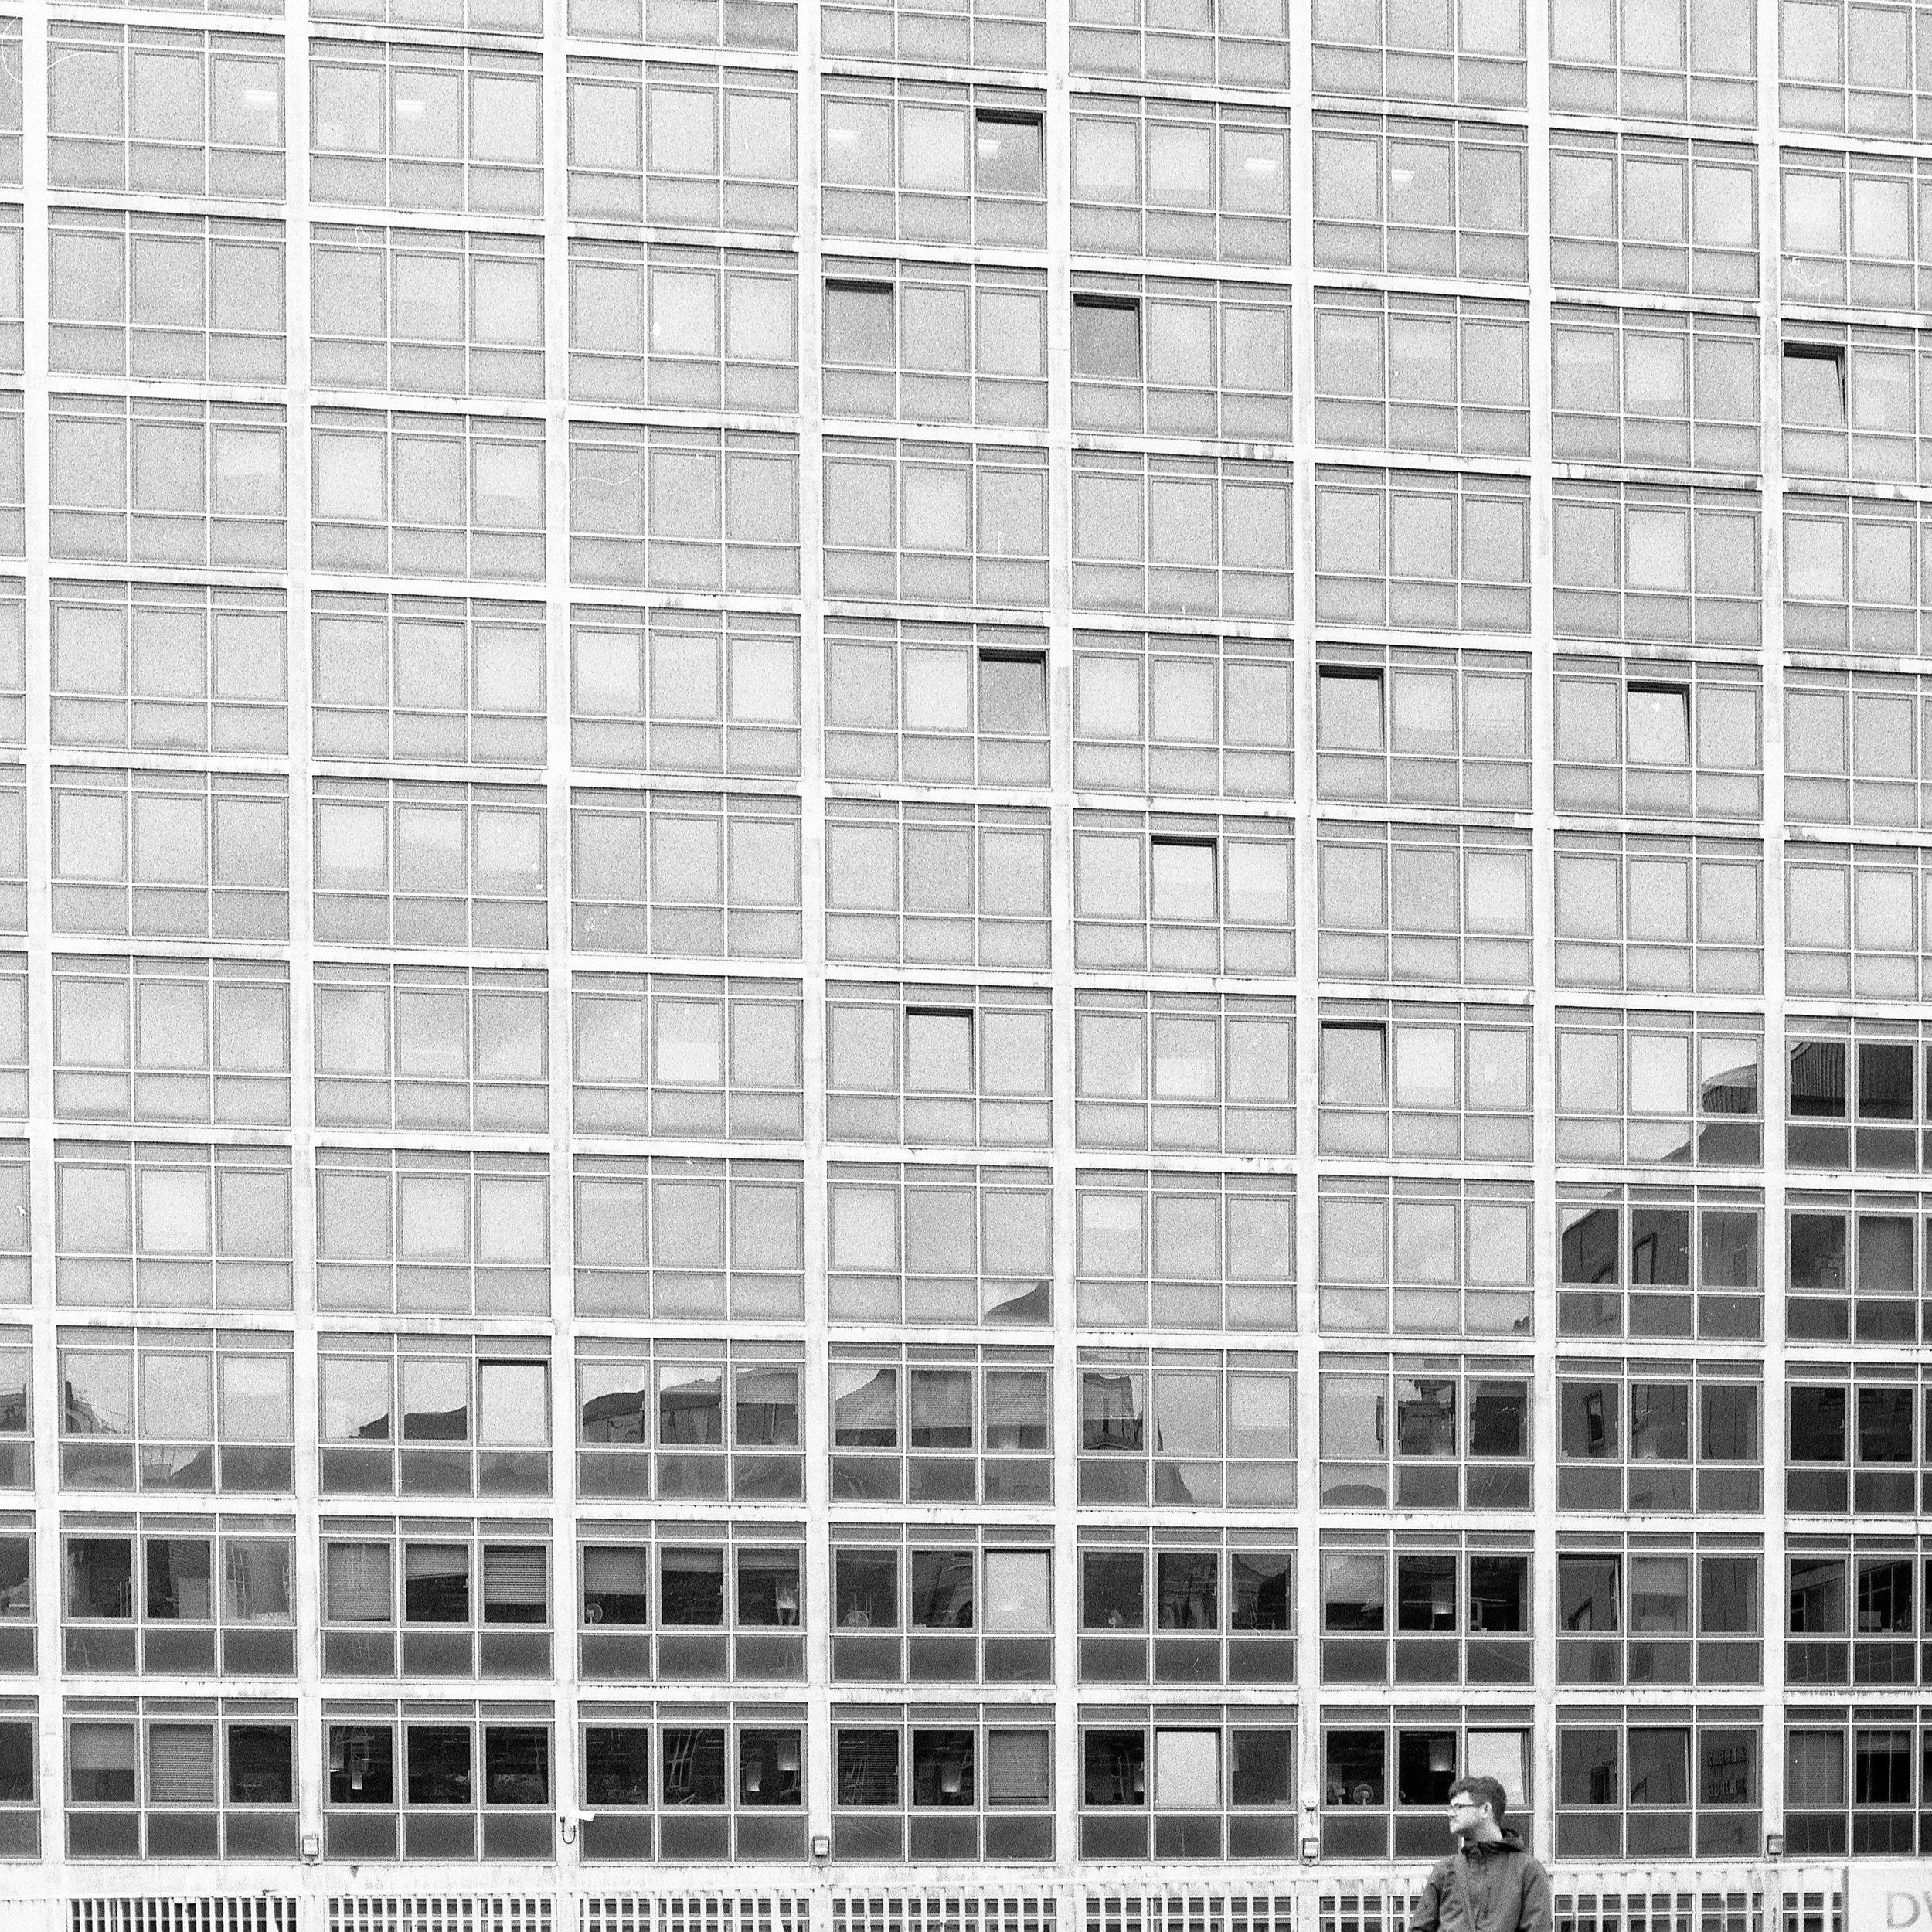 Manchester 2019 ©PMB